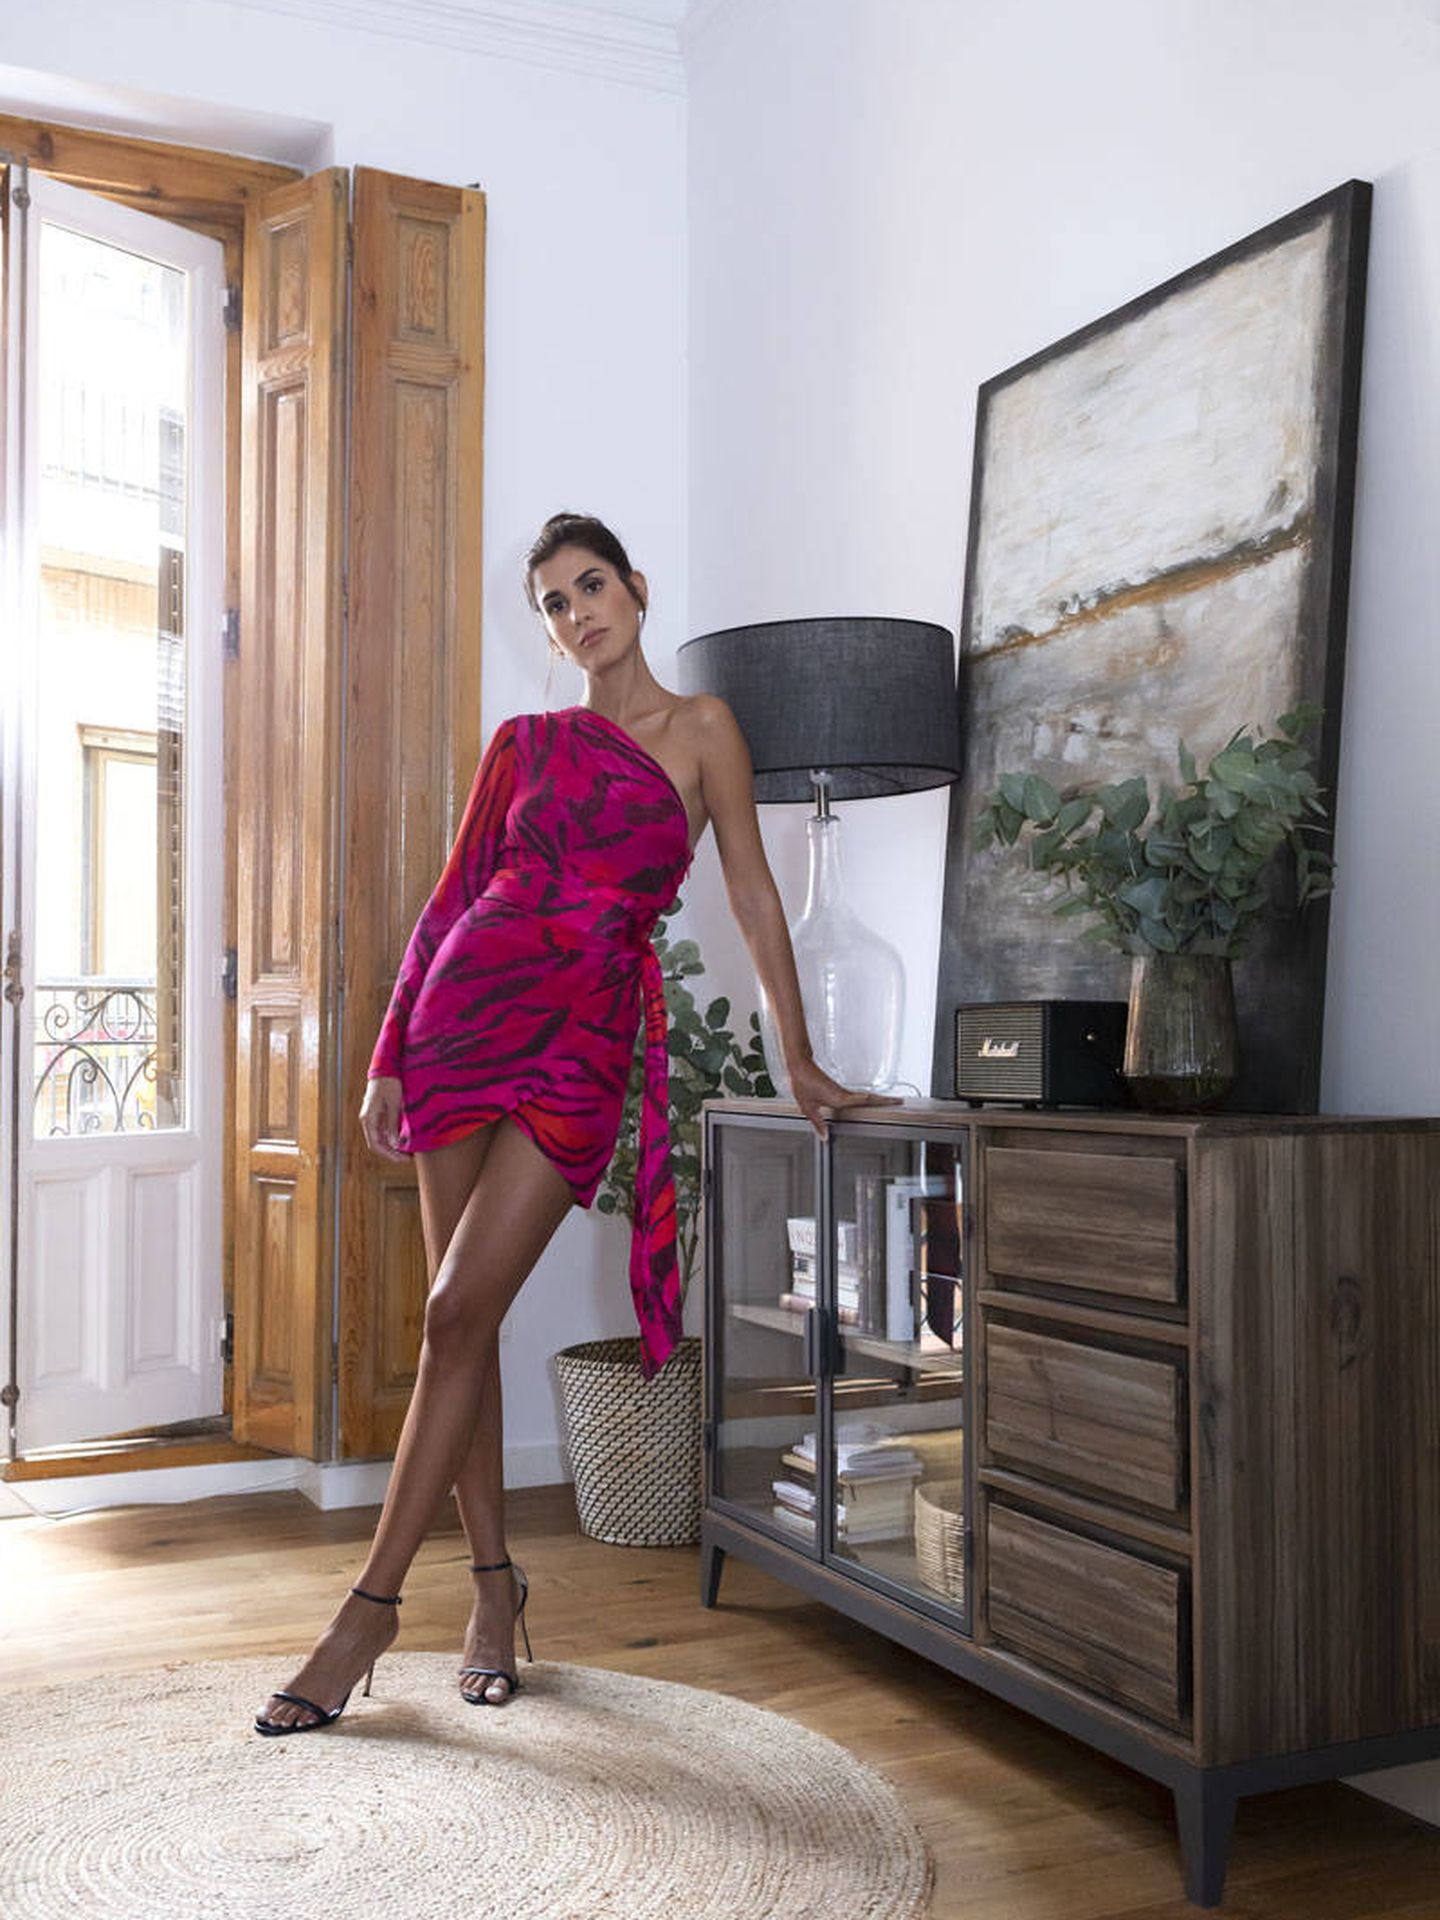 Mery Turiel posa con sandalias de Carolina Herrera y vestido de Adriana Iglesias.